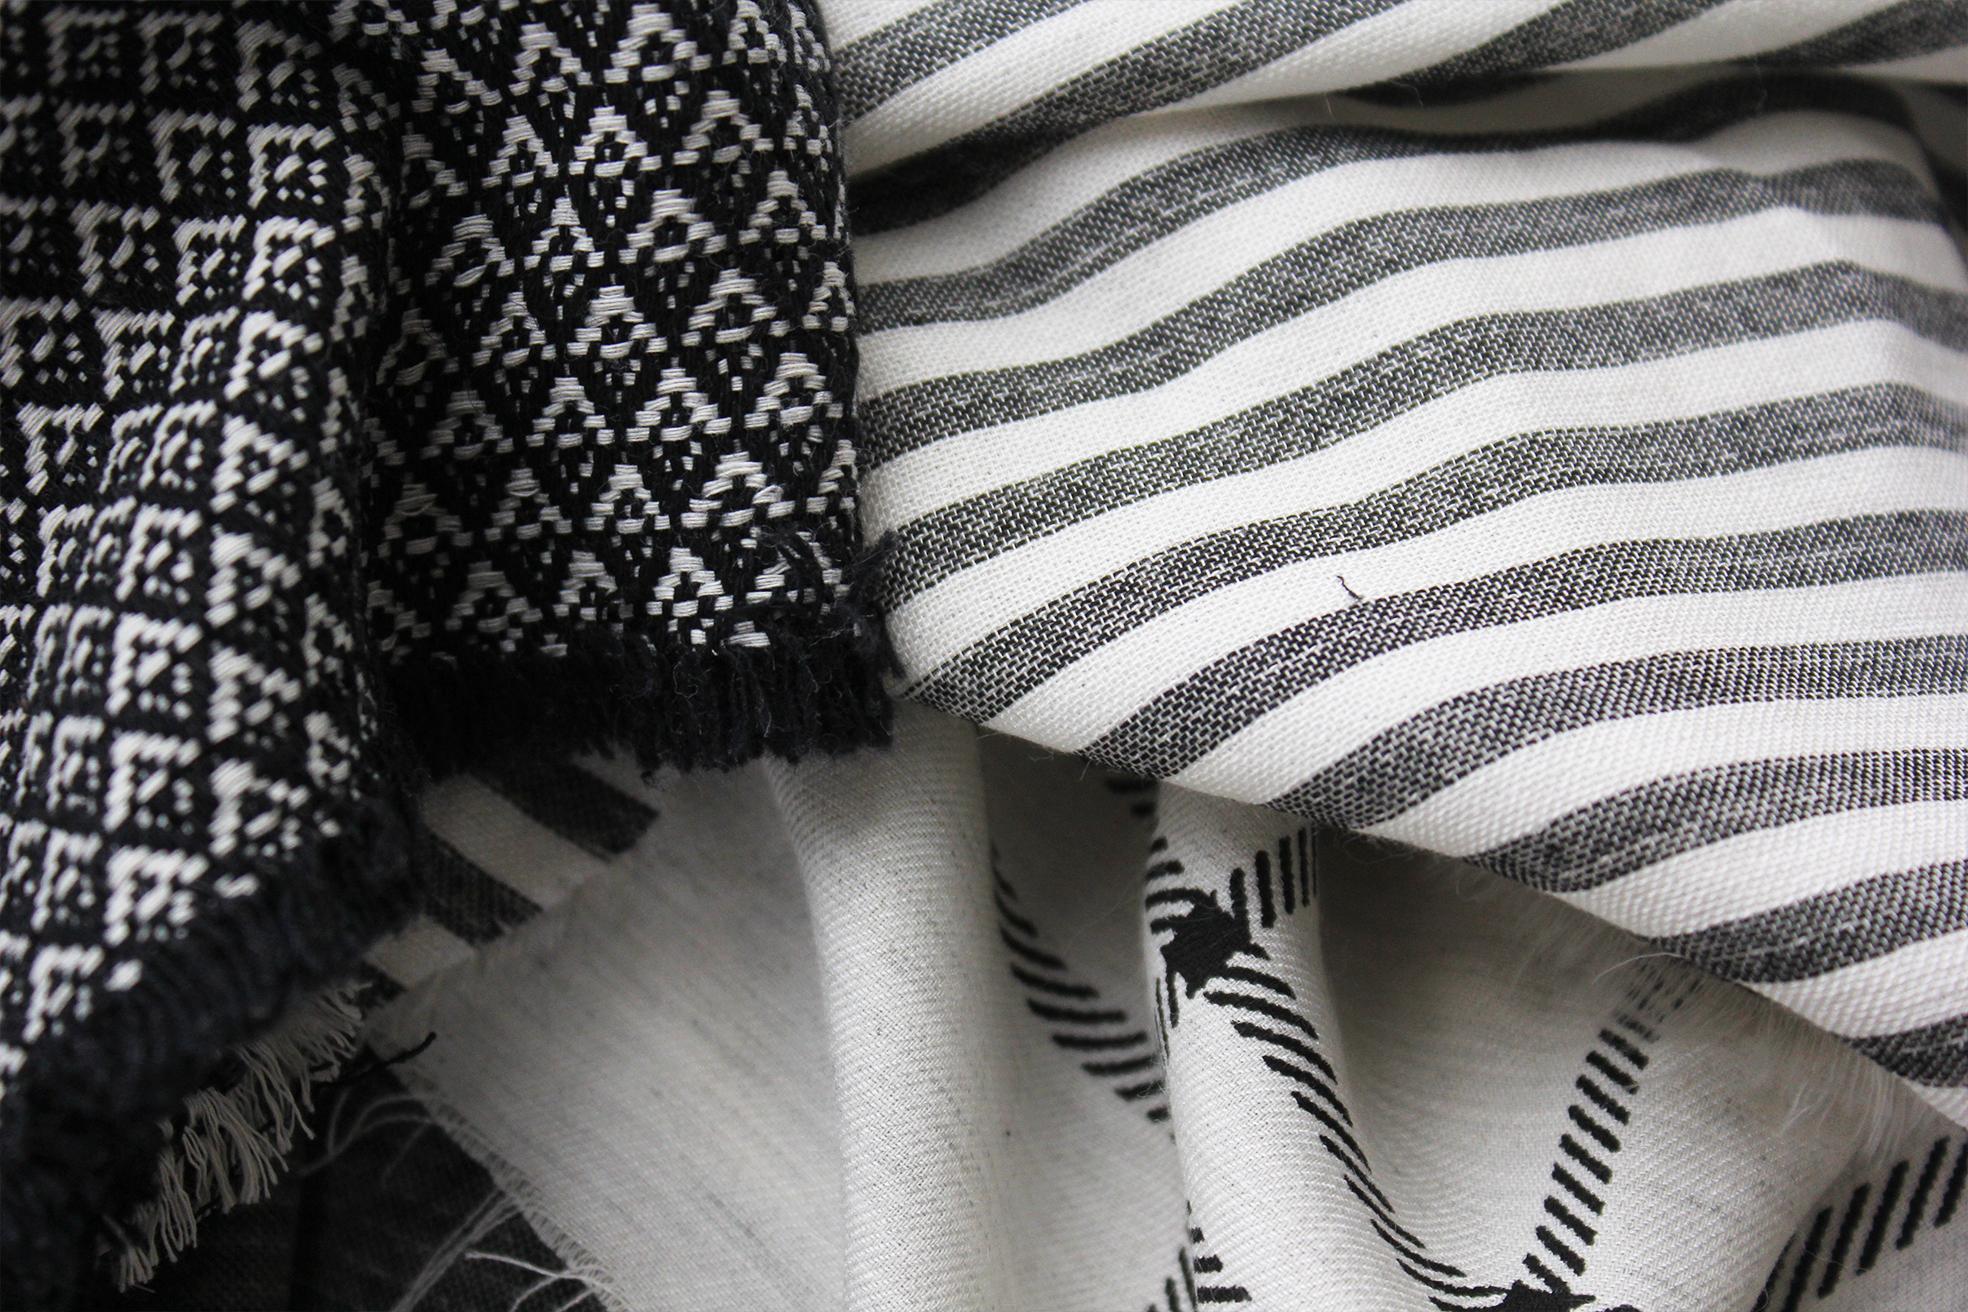 tissu percale coton rayure noir et blanc folkandfabric. Black Bedroom Furniture Sets. Home Design Ideas